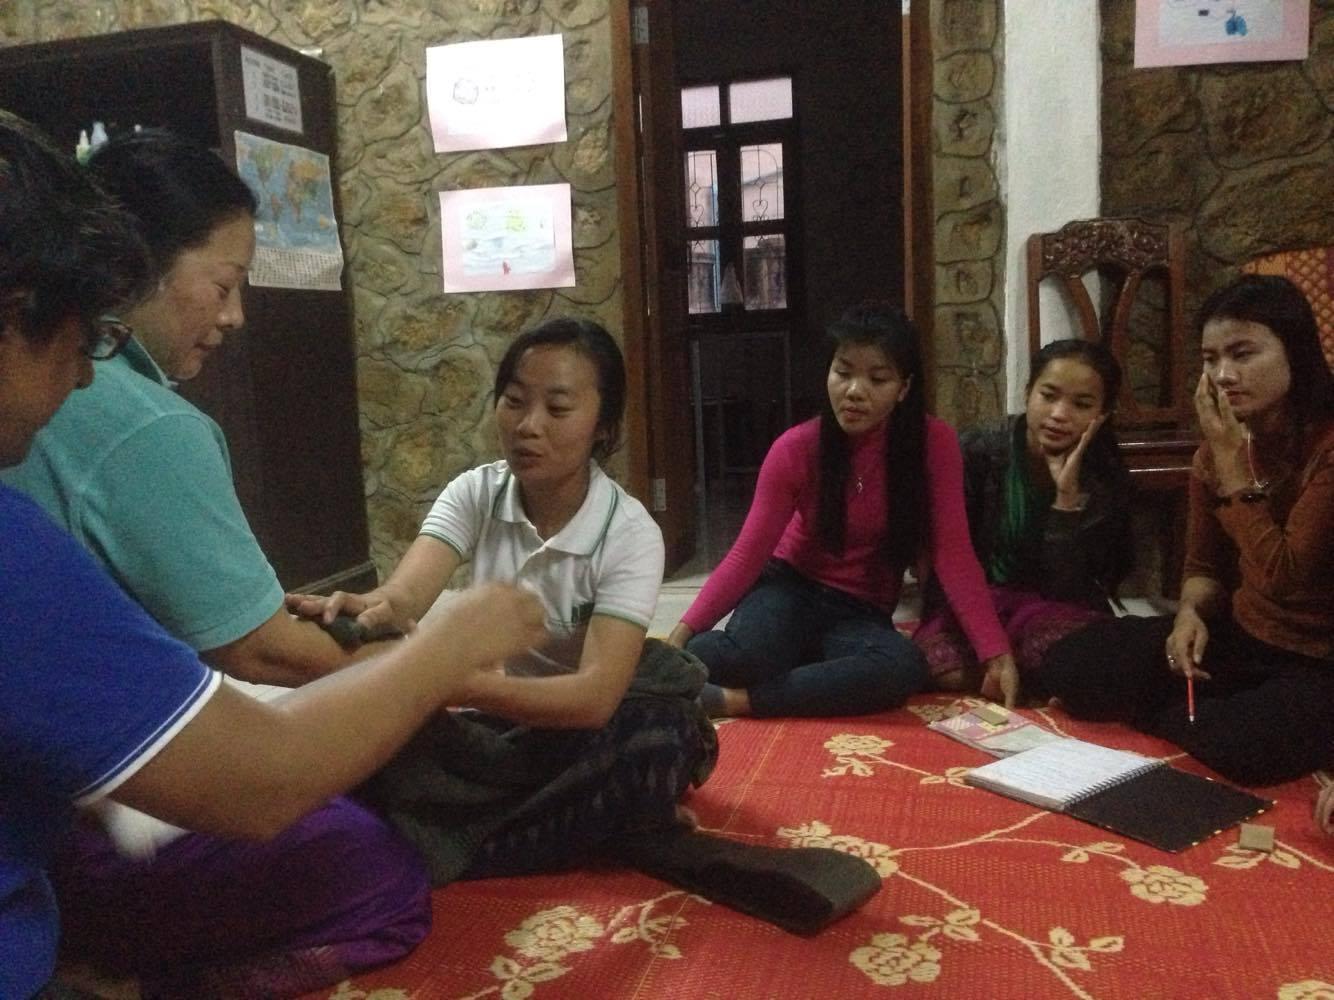 Laosi National Scholarship Student with GVI in Luang Prabang